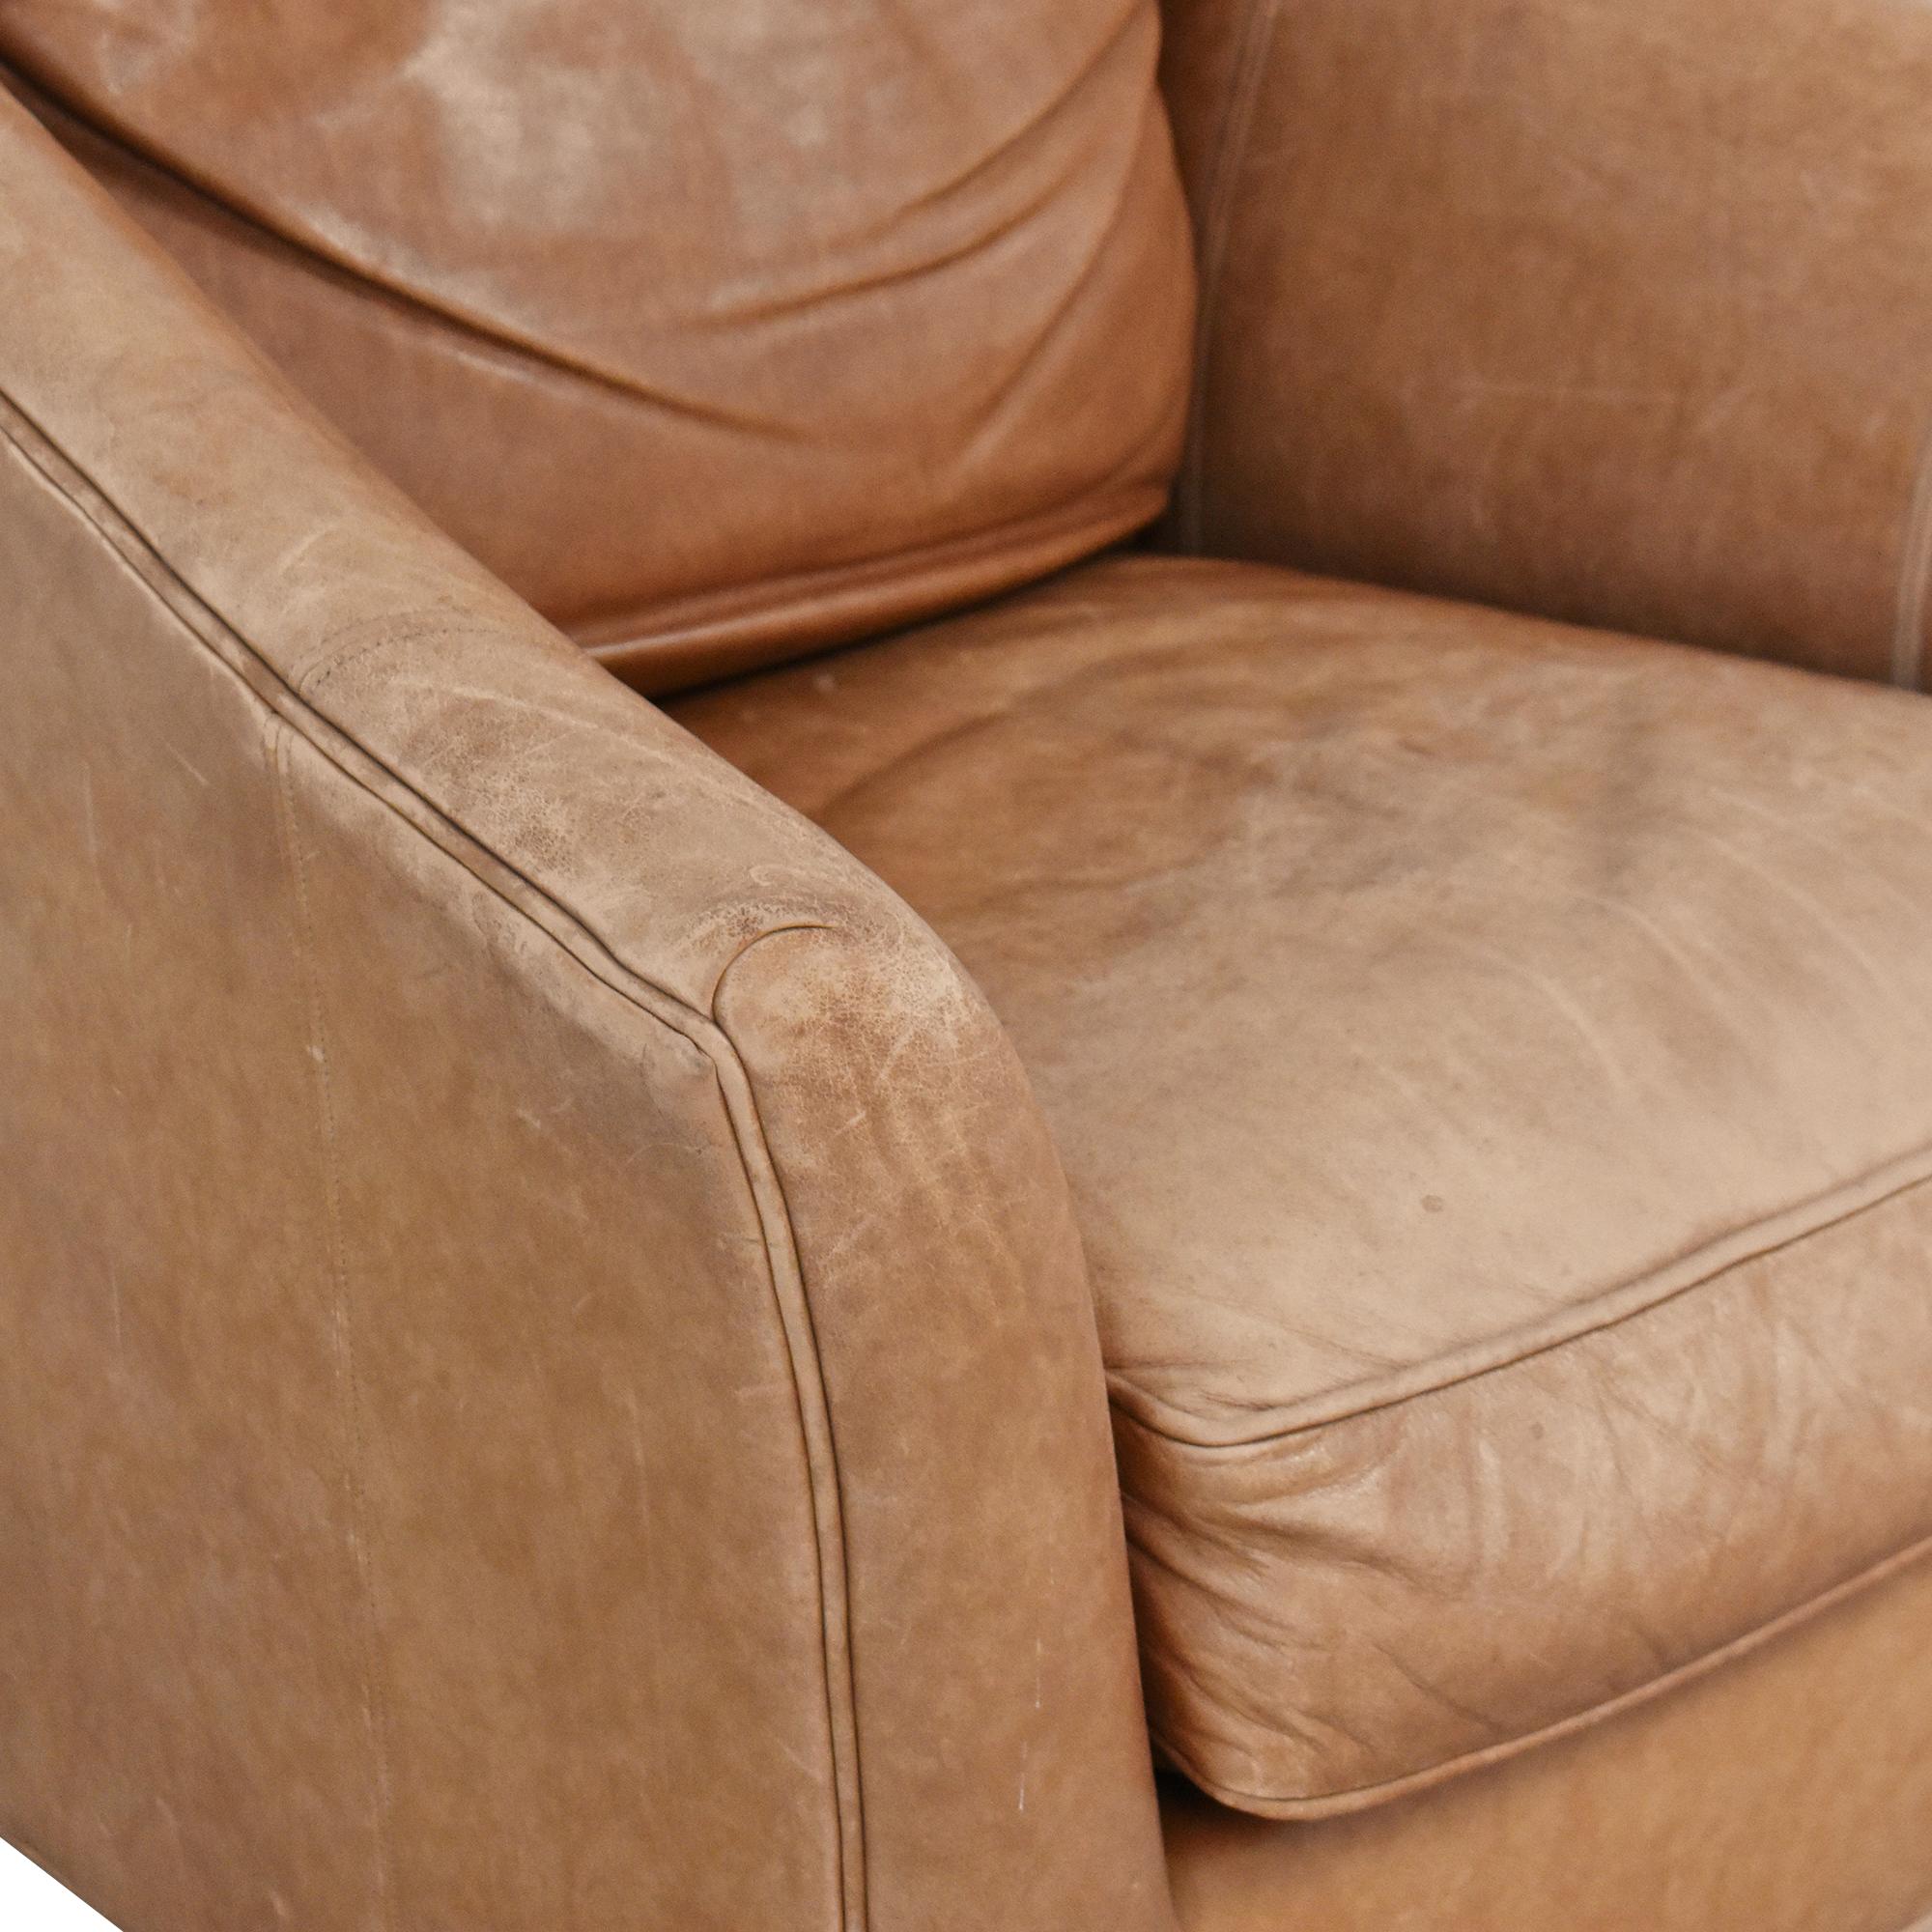 Ethan Allen Ethan Allen Flare Arm Accent Chair ct